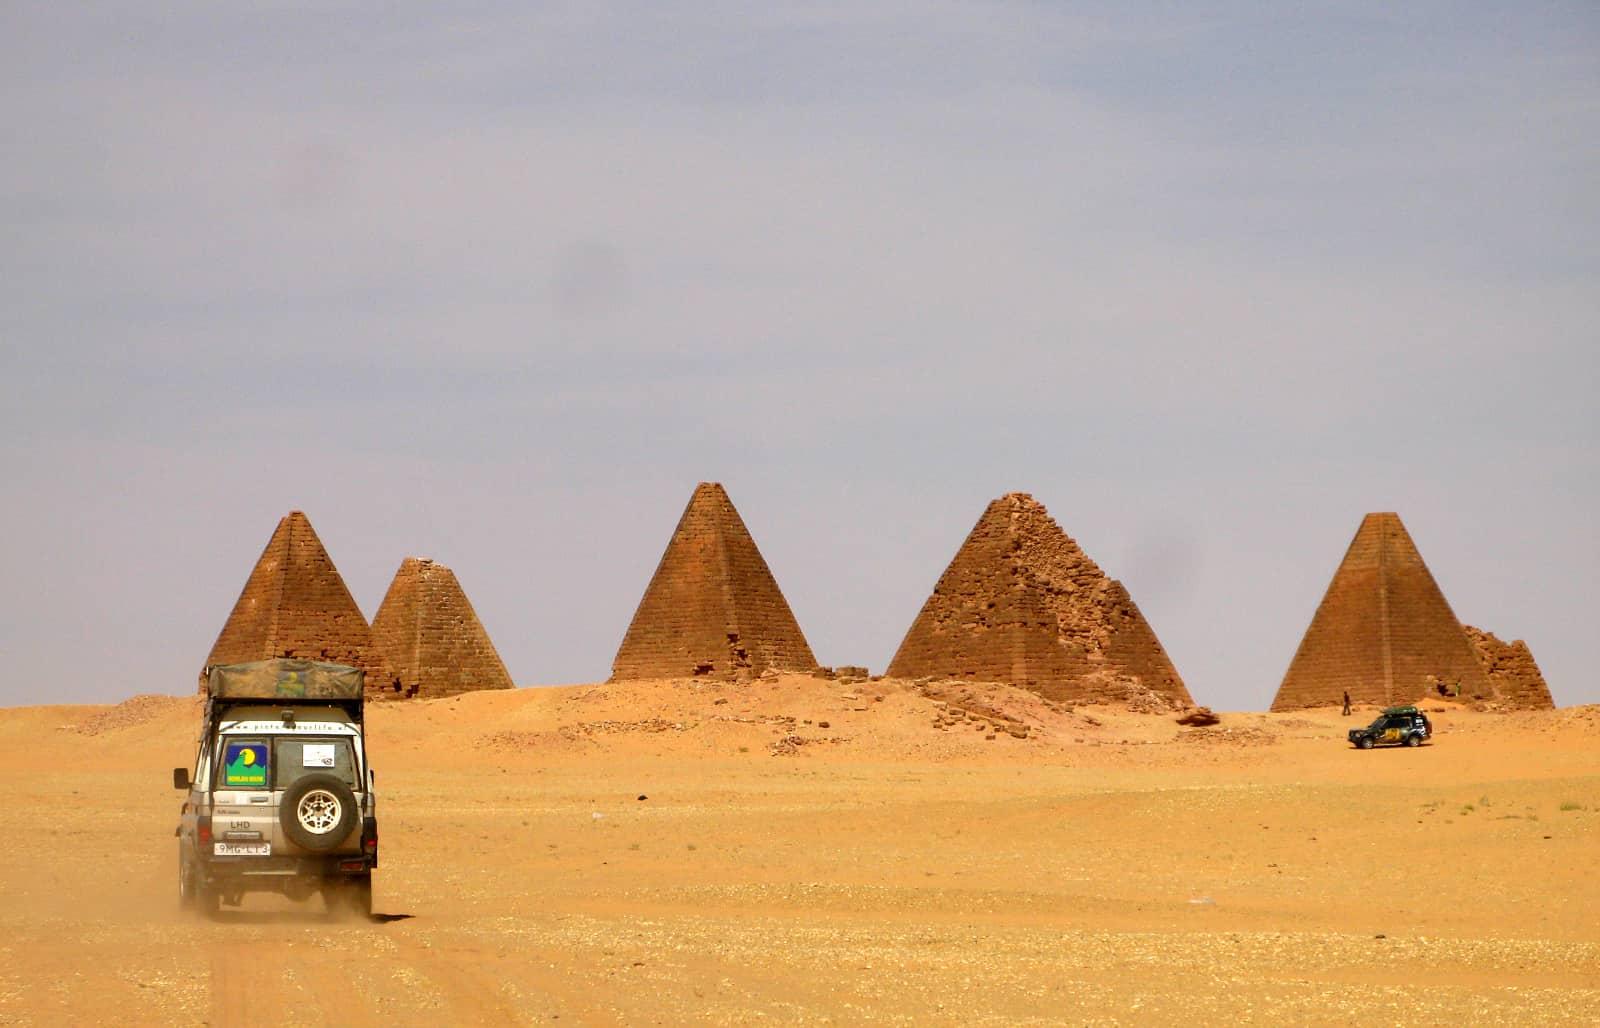 Ilvy Njiokiktjien - woestijn Sudan met pyramides